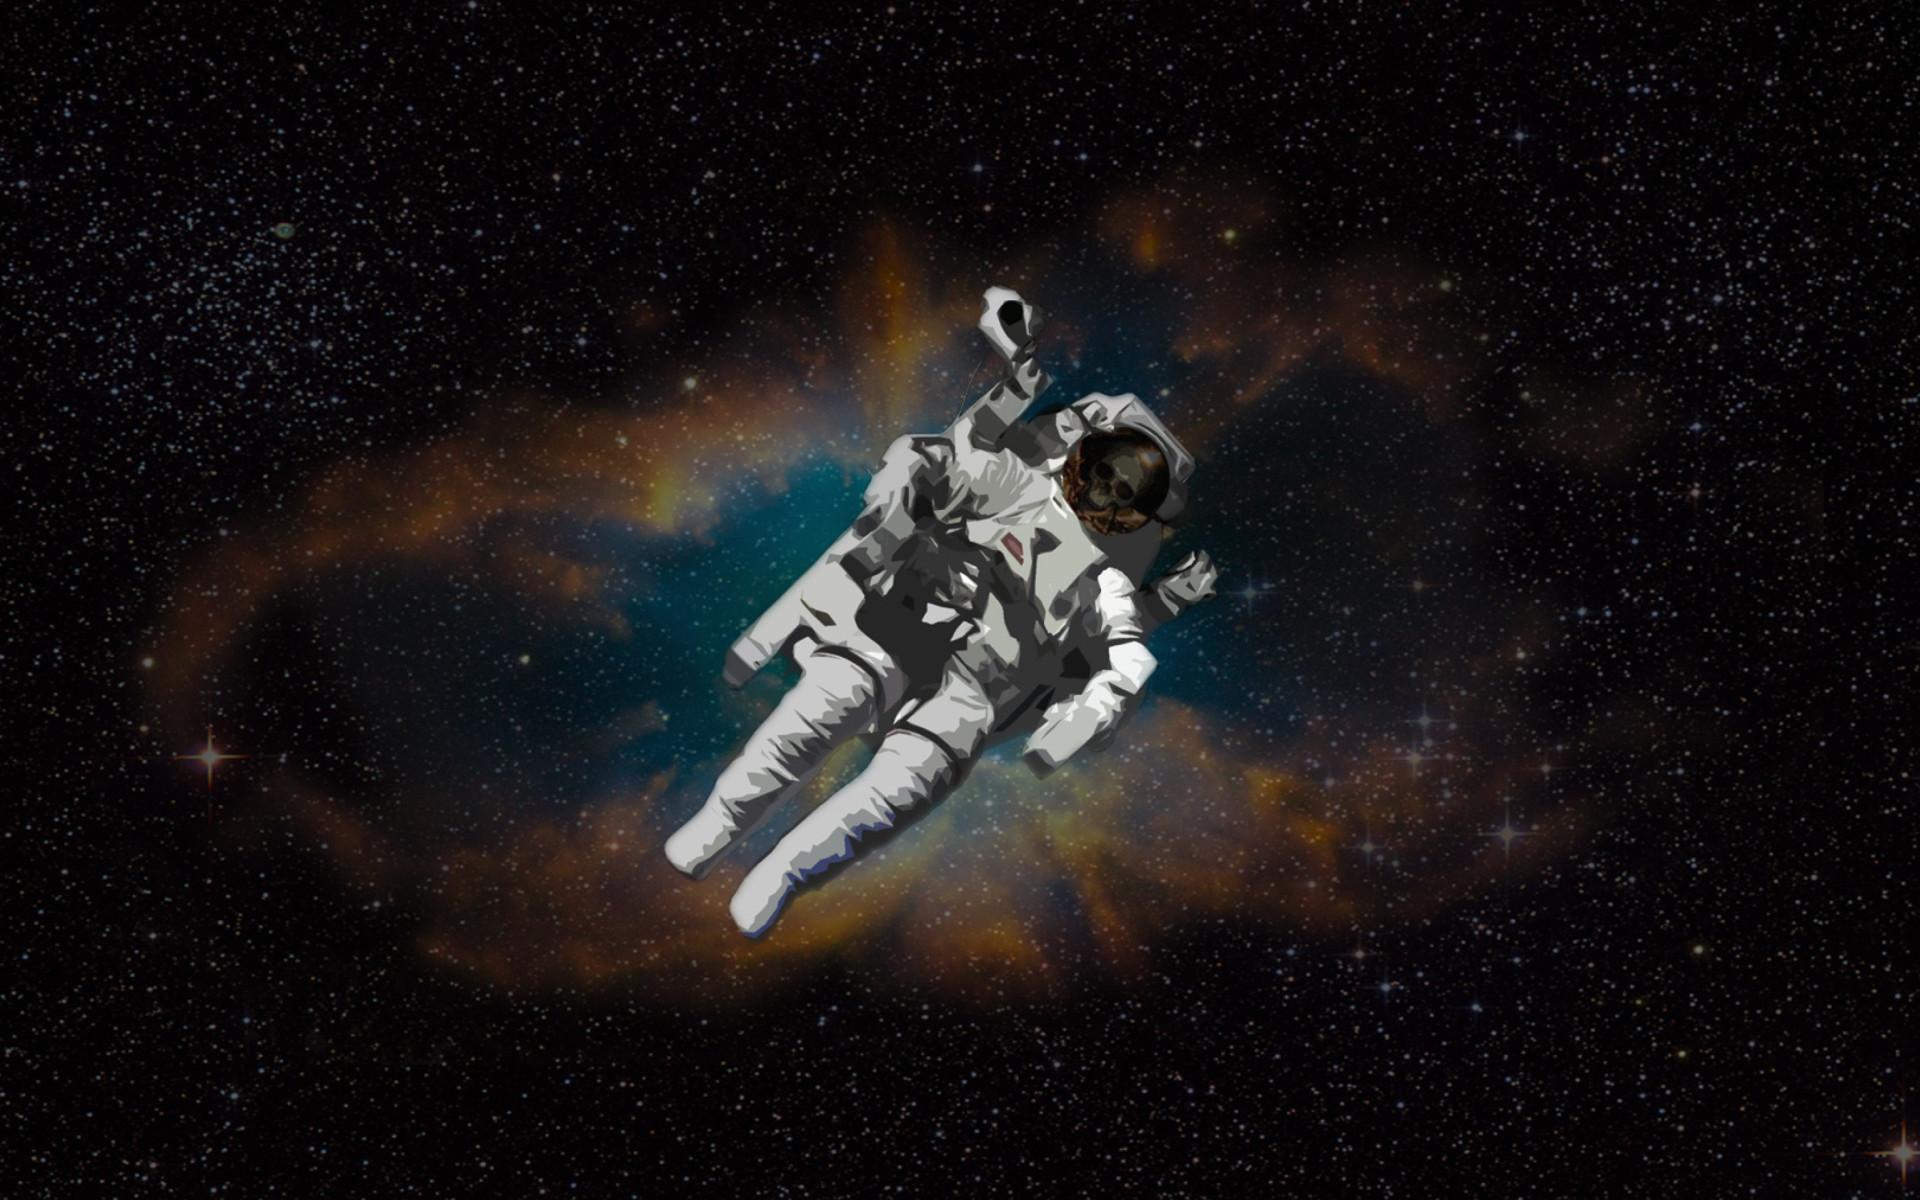 Kostenloses Skull Of Astronaut In Space Wallpaper für Widescreen .